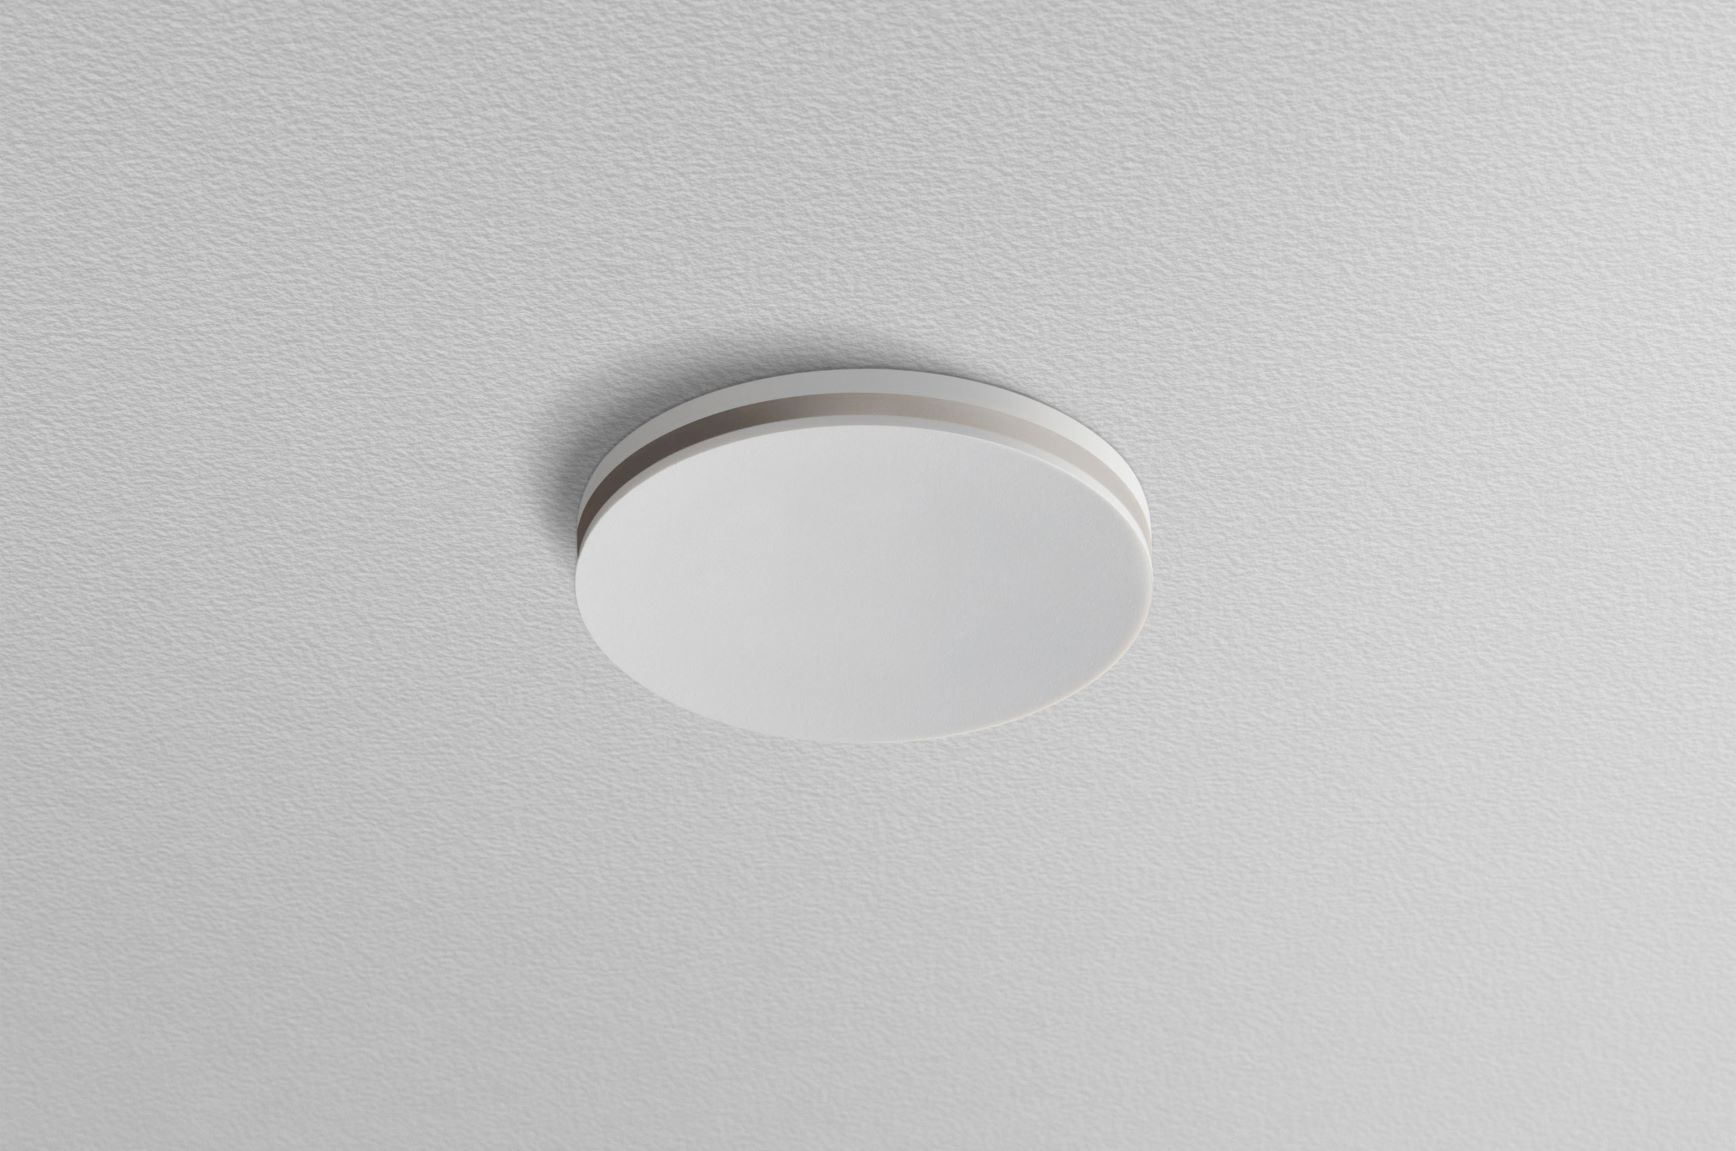 Ceiling-mounted temperature sensor (round type)